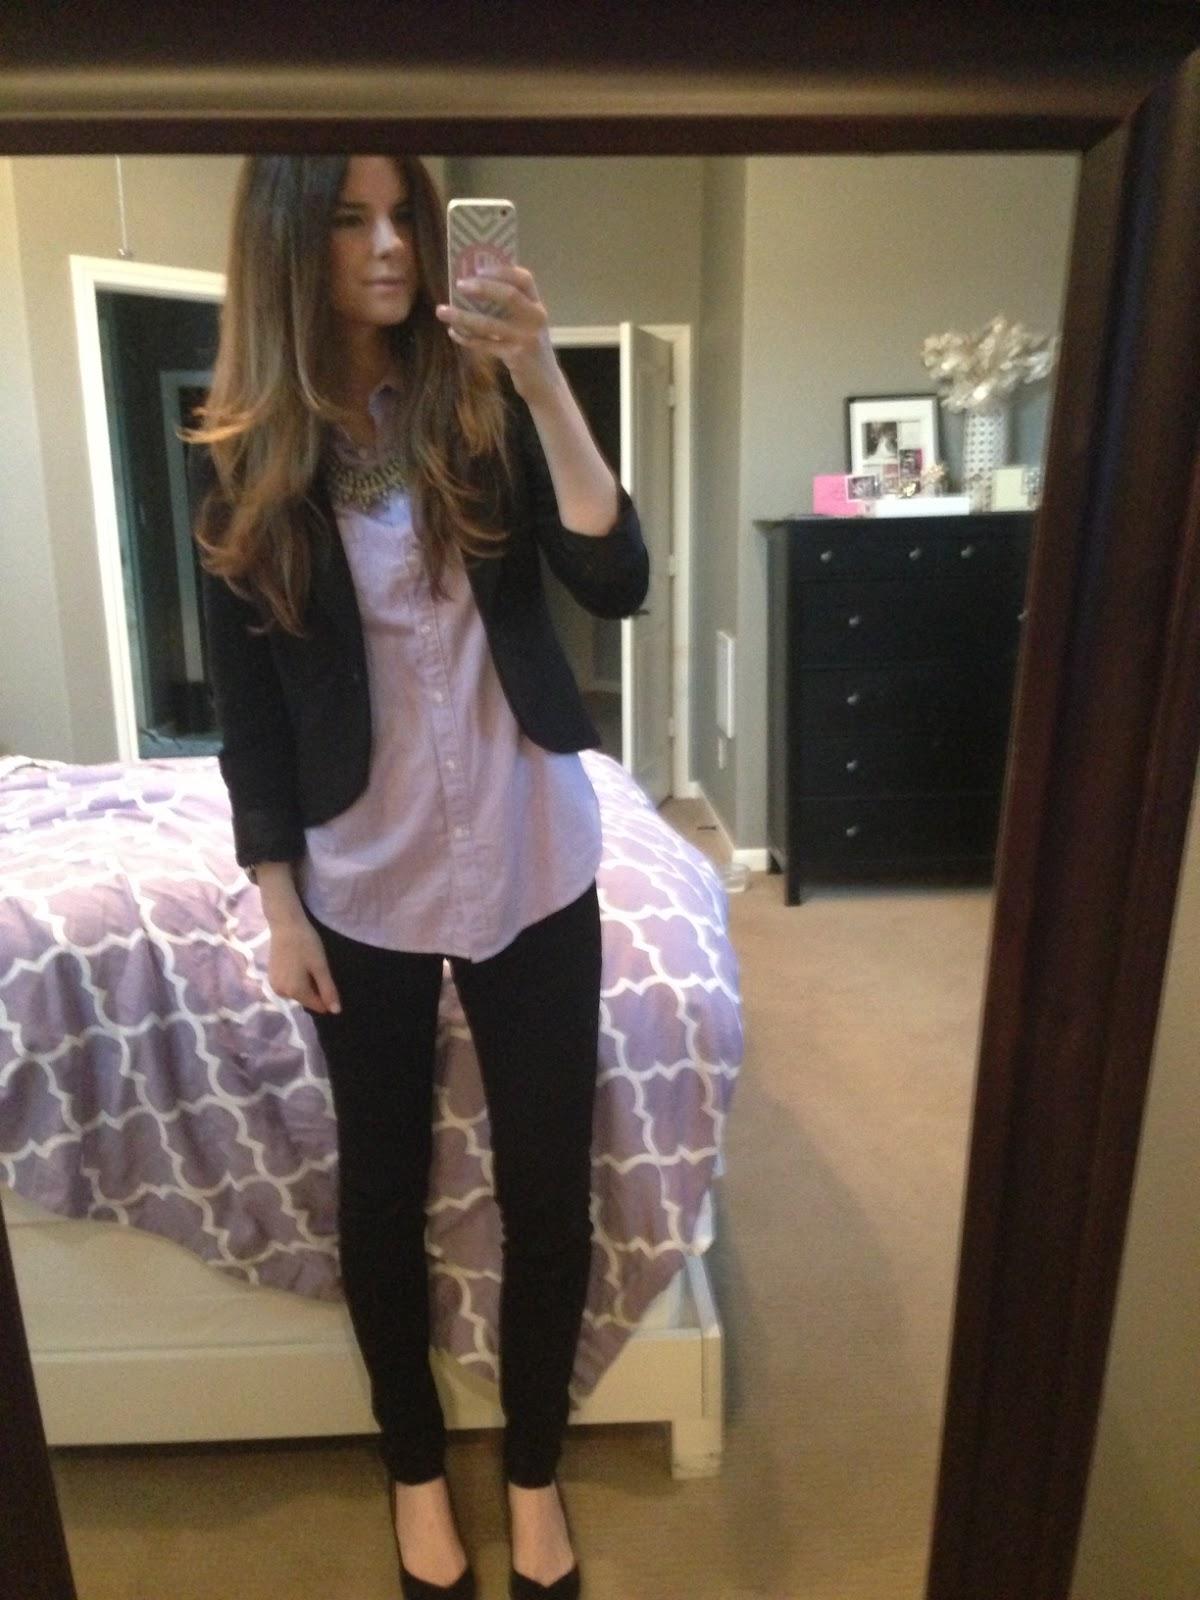 Ph8 clothing online